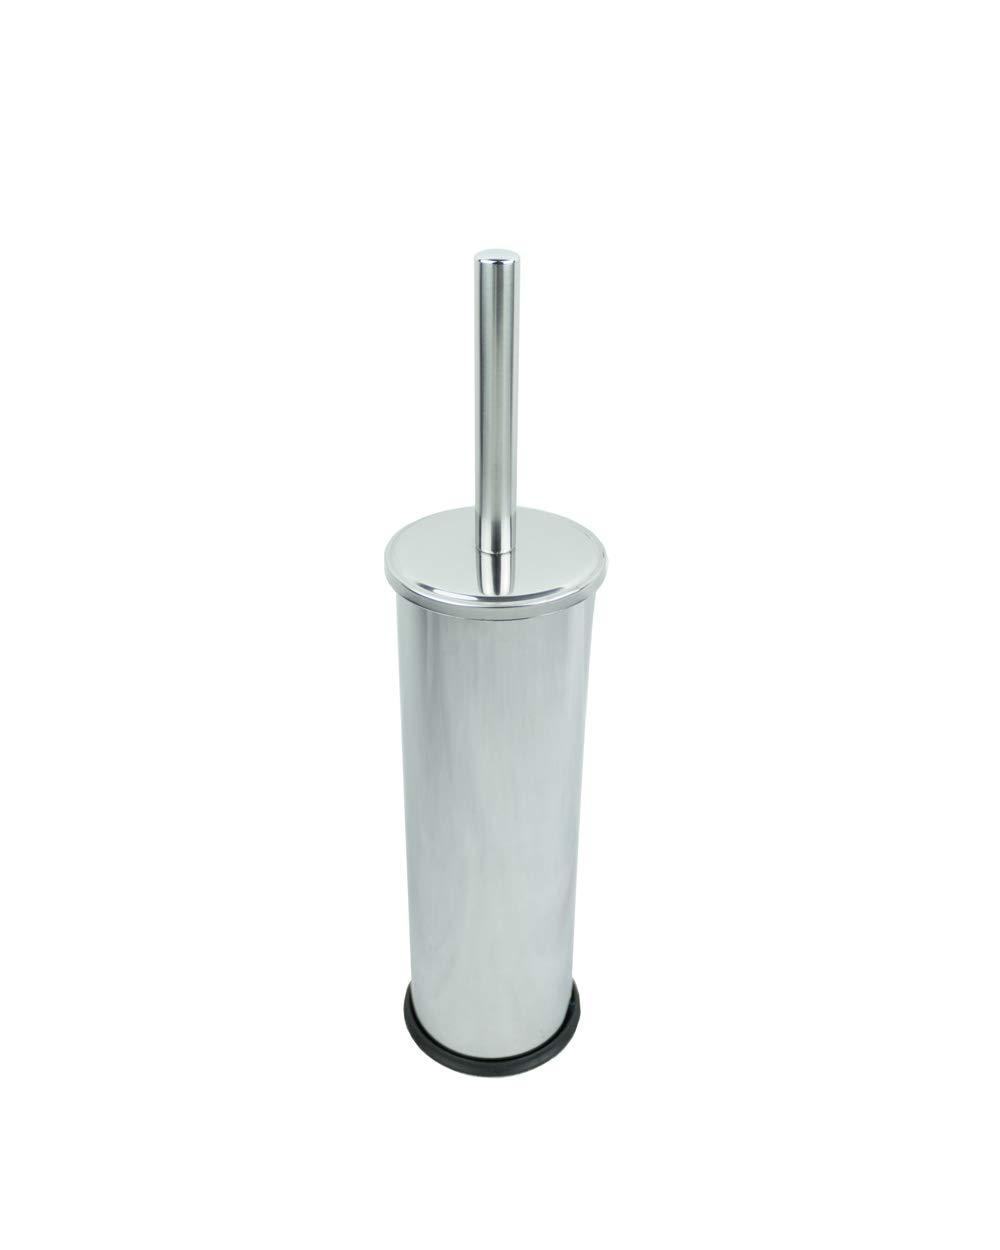 Kugel Bürstengarnitur Klobürste Toilettenbürste Edelstahl 37cm WC-Garnitur